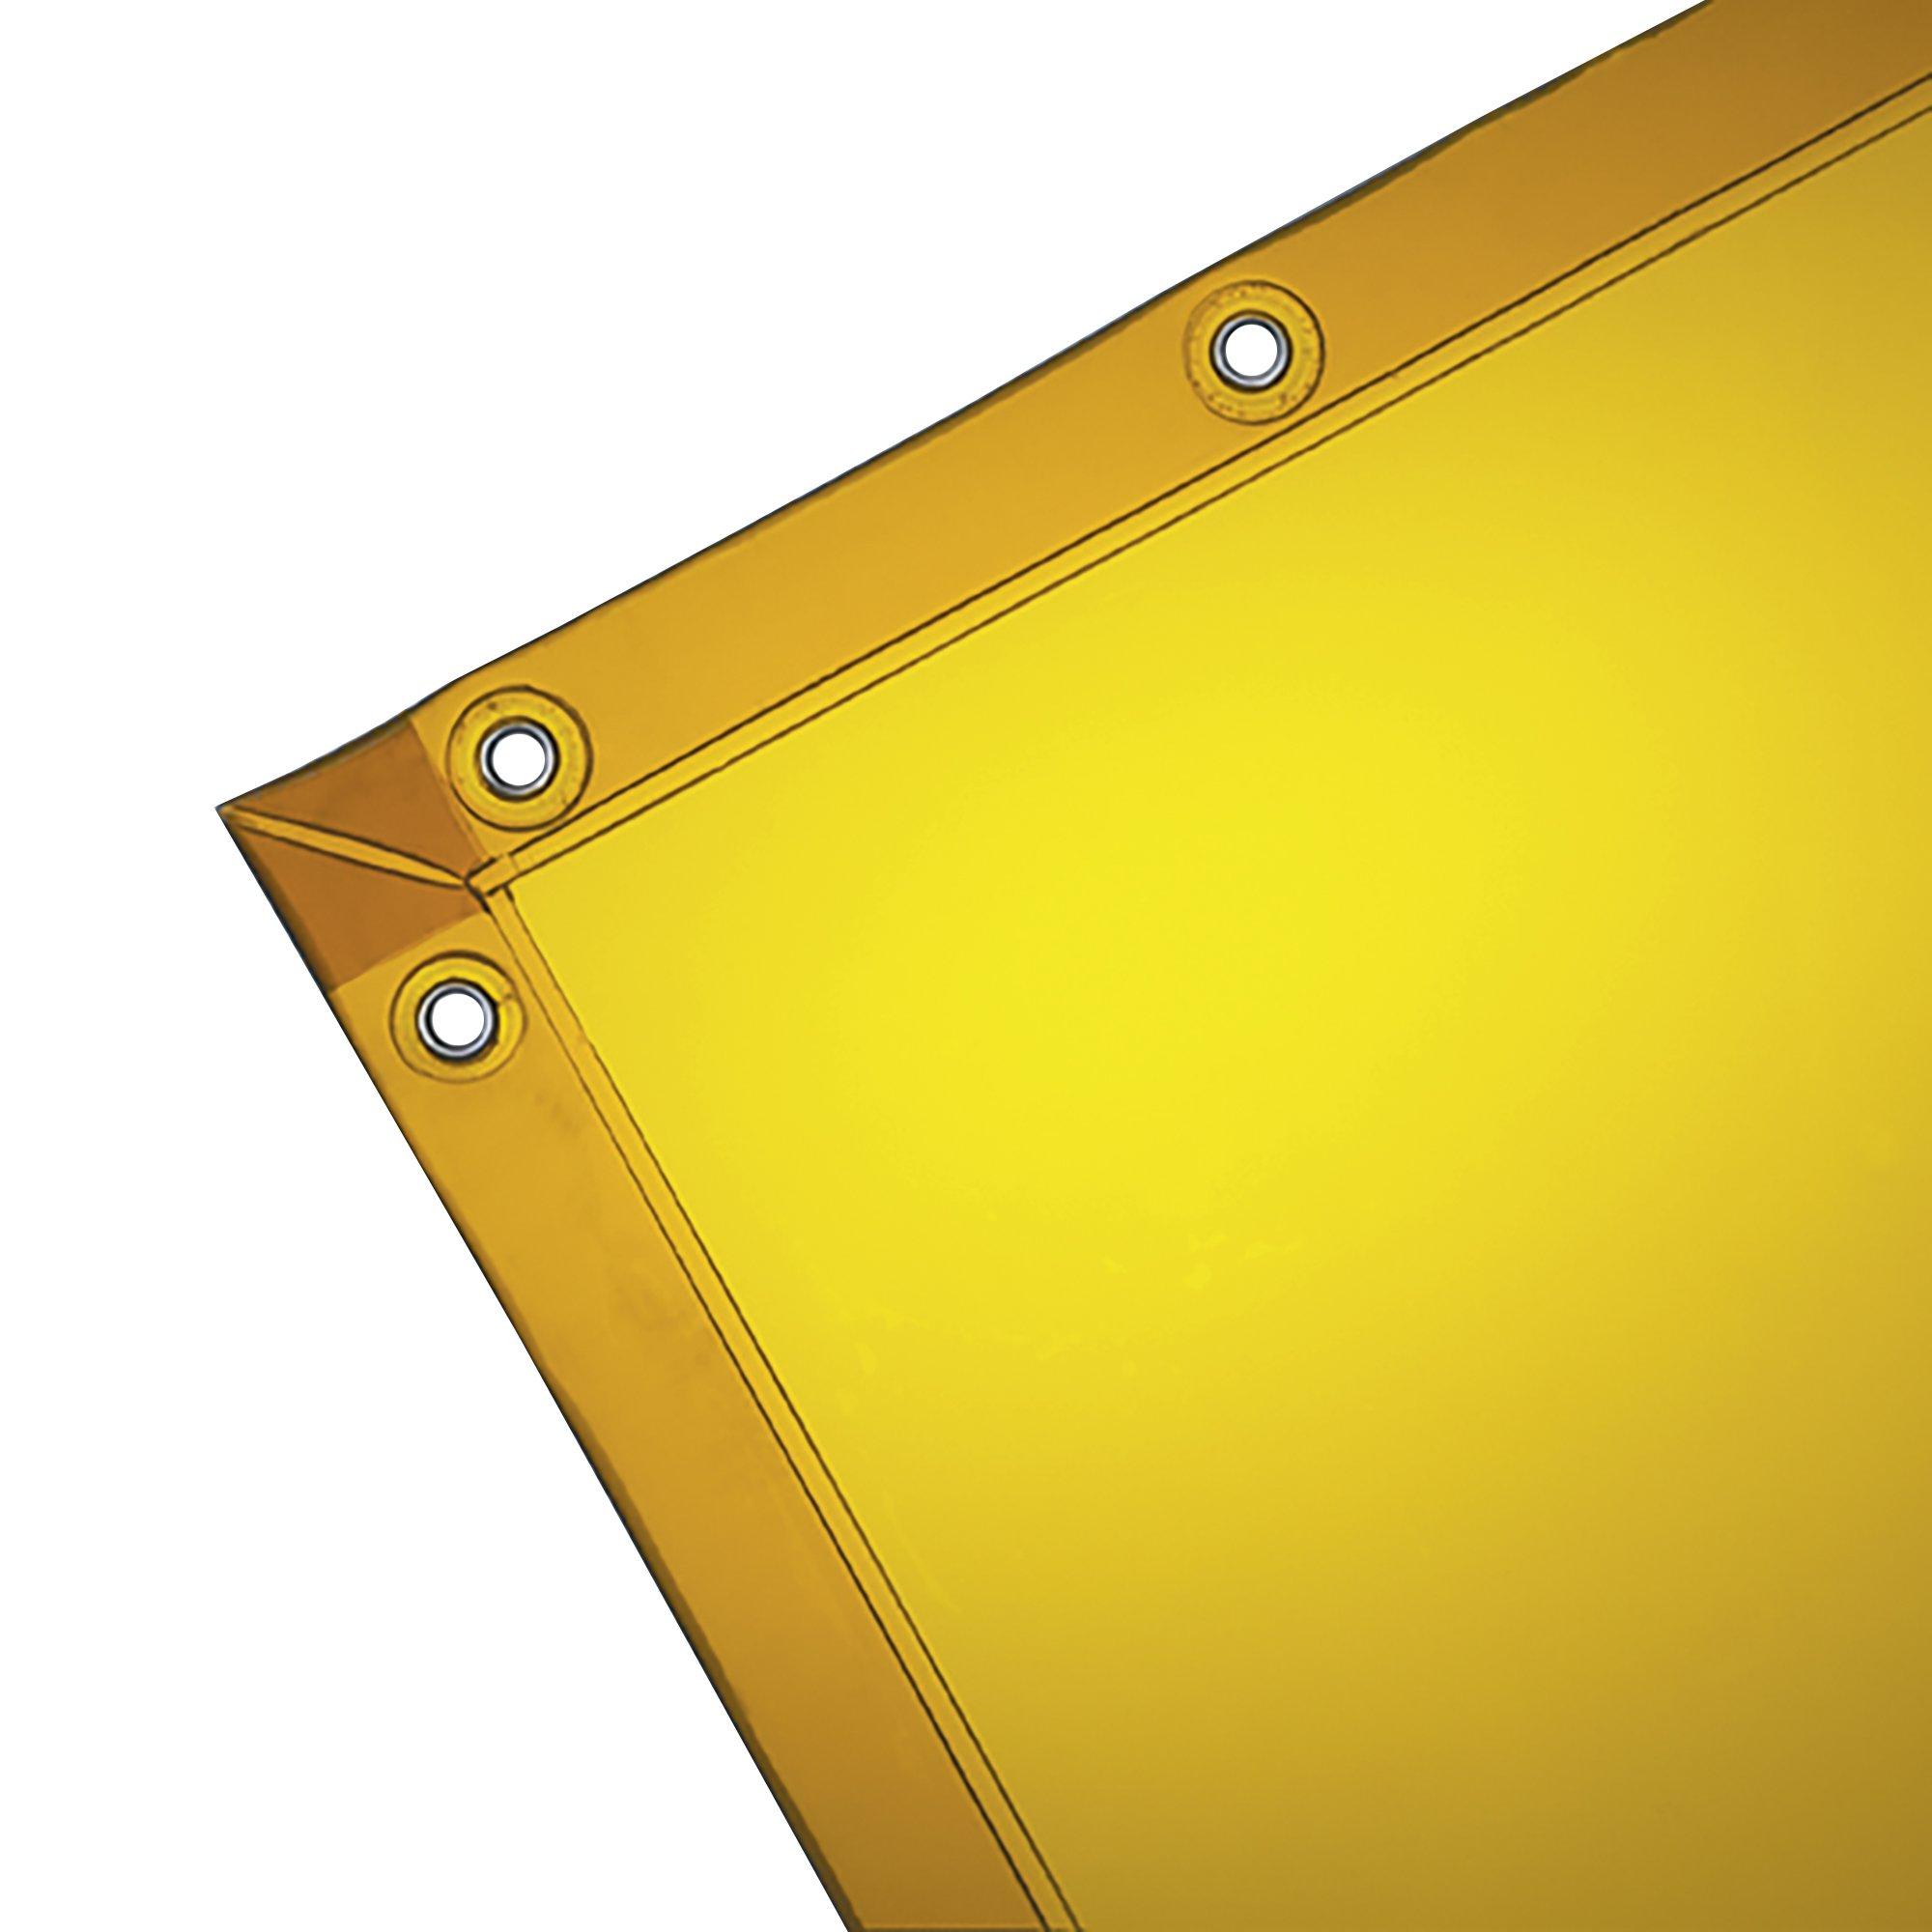 Wilson 14-Mil See-Thru Welding Curtain (36312), 6 x 8 feet, Gold Vinyl Curtain, Standard Grommets, 1 / Bag, 10 / Case by Wilson